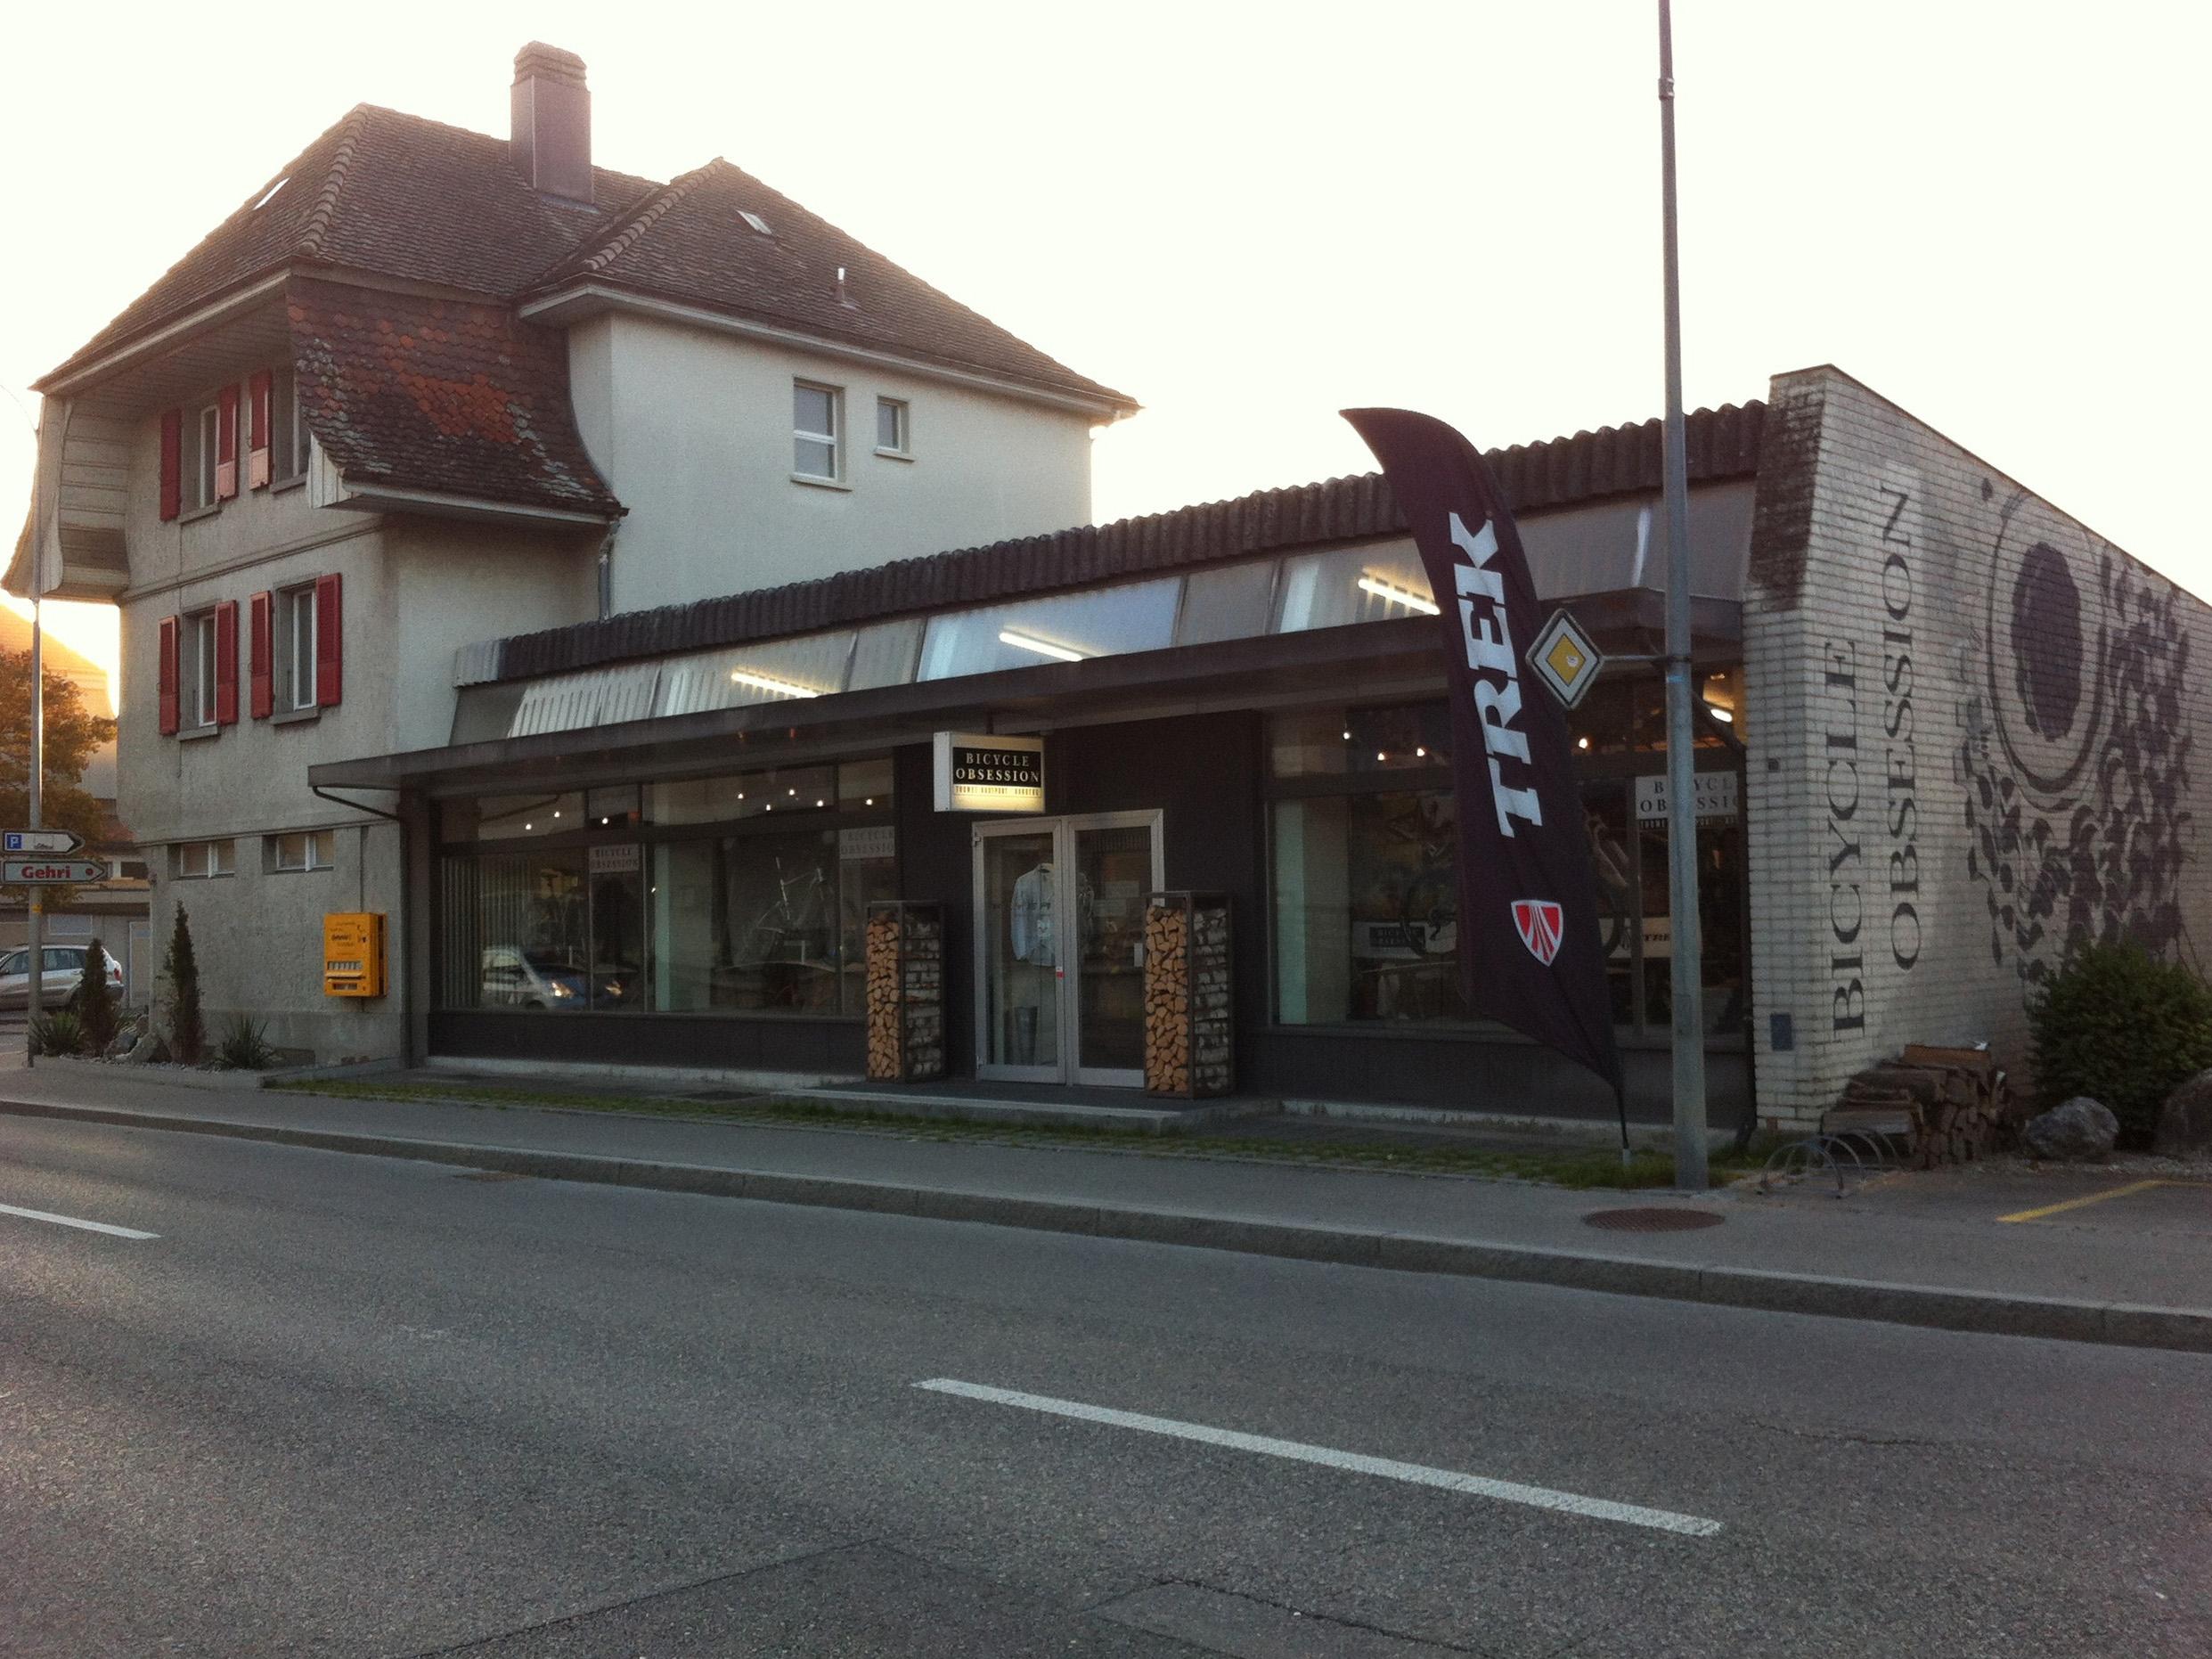 Thomet Radsport GmbH